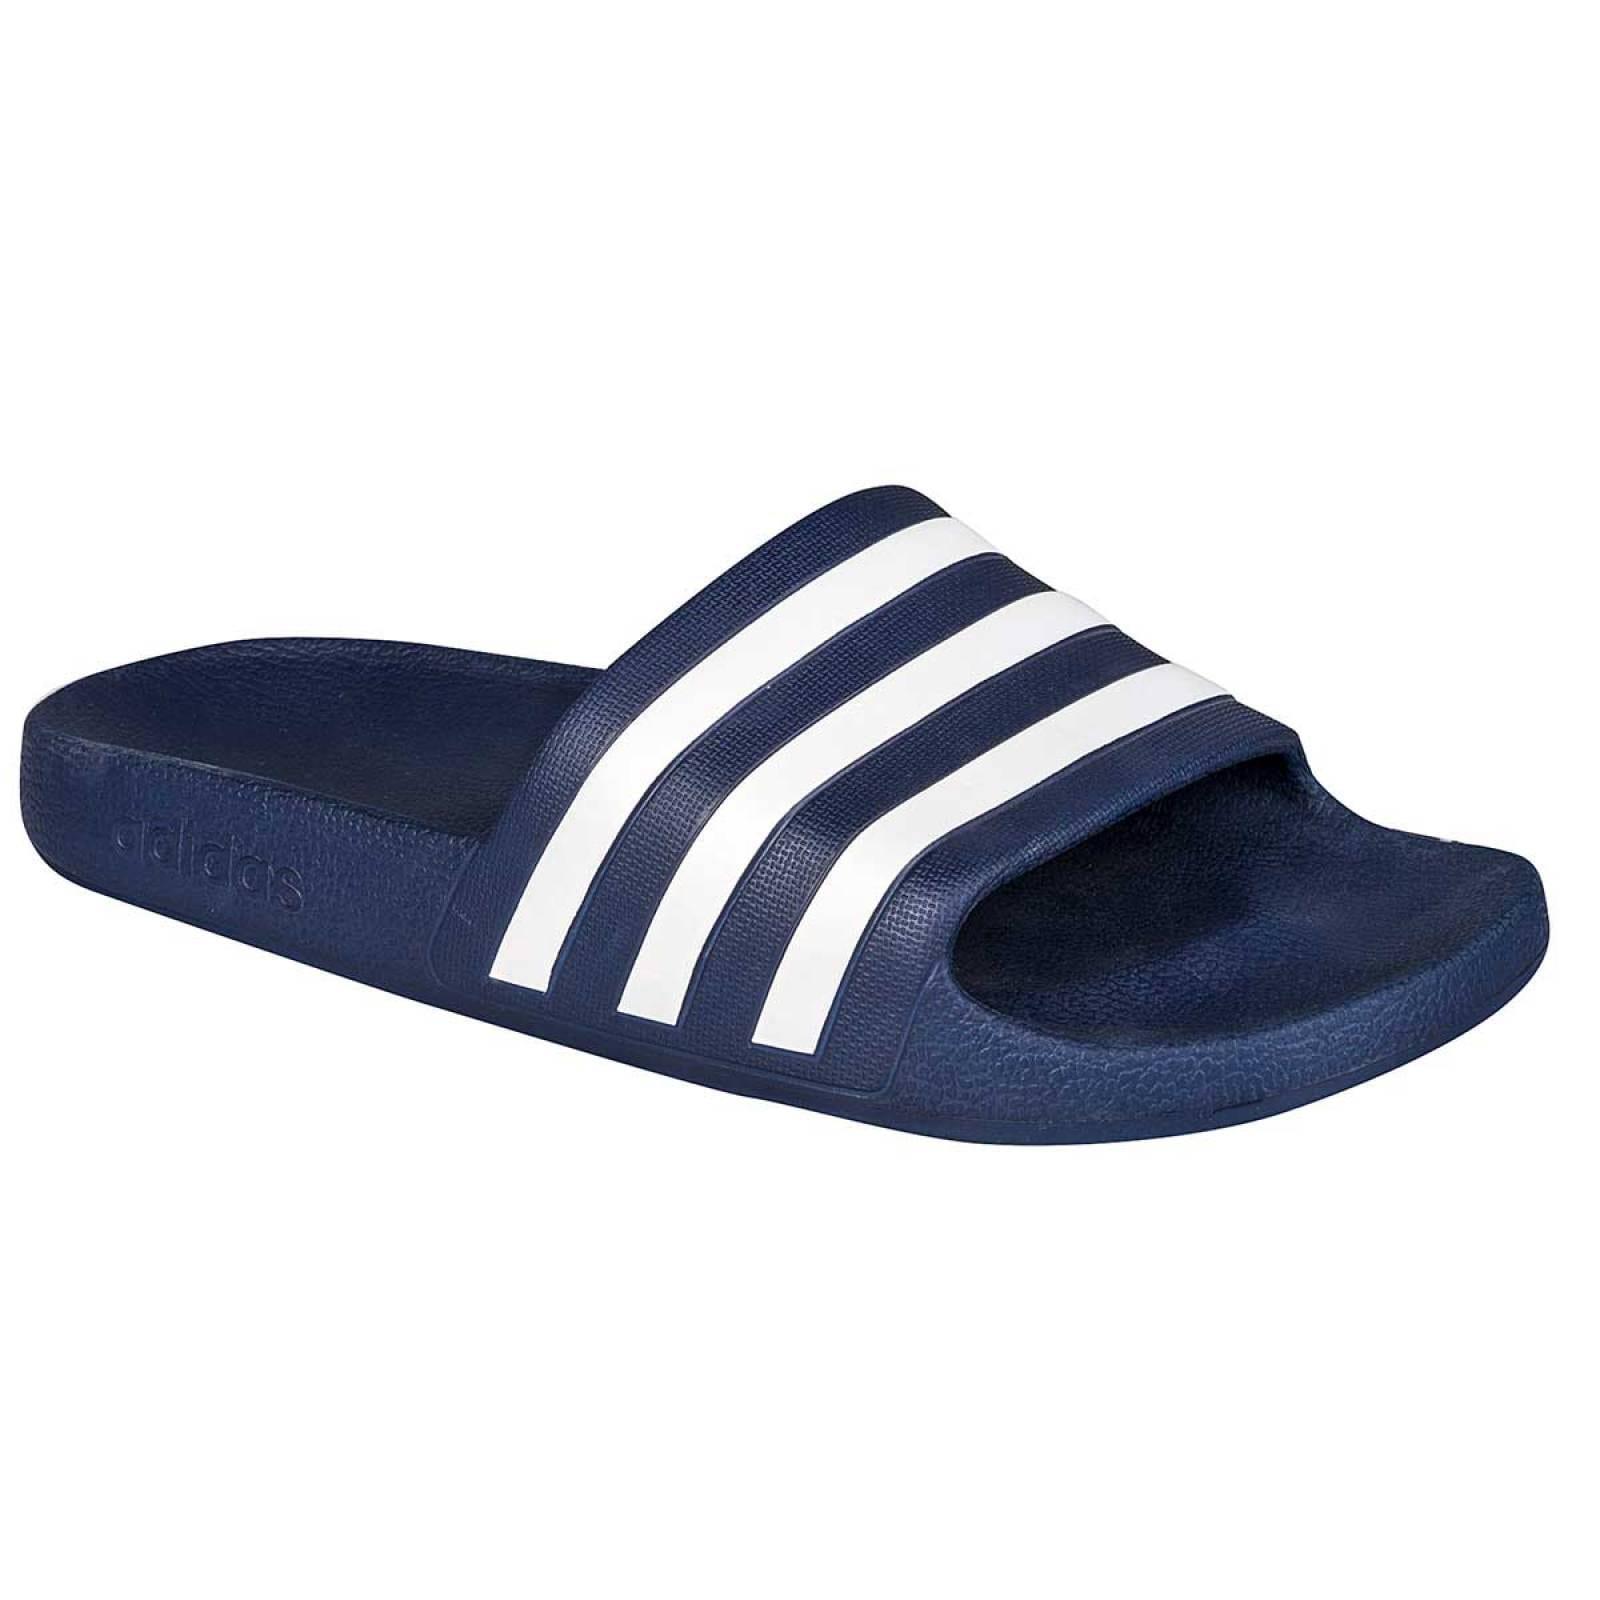 Adidas Sandalia Hombre Marino blanco adilette aqua